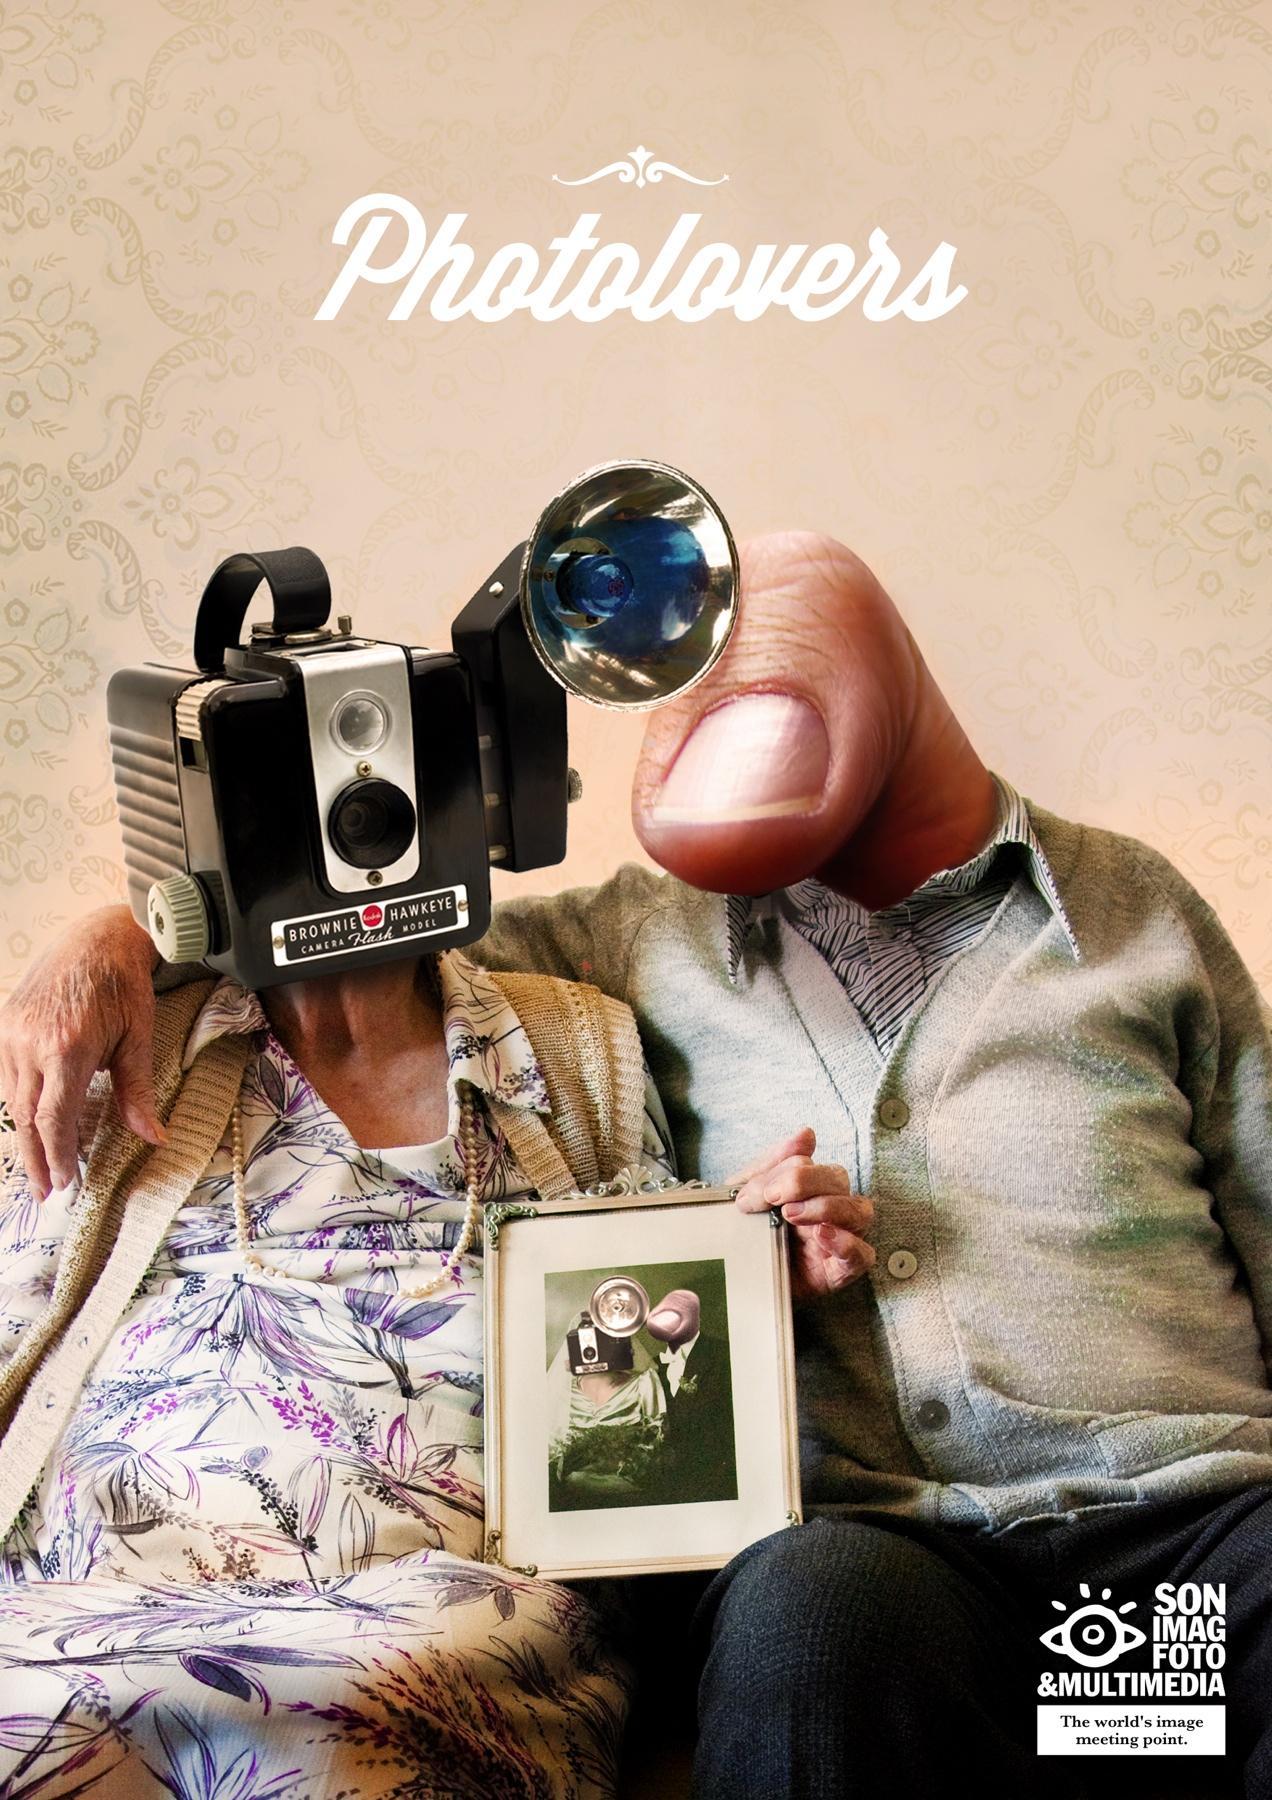 Sonimagfoto Print Ad -  Professional Photolovers